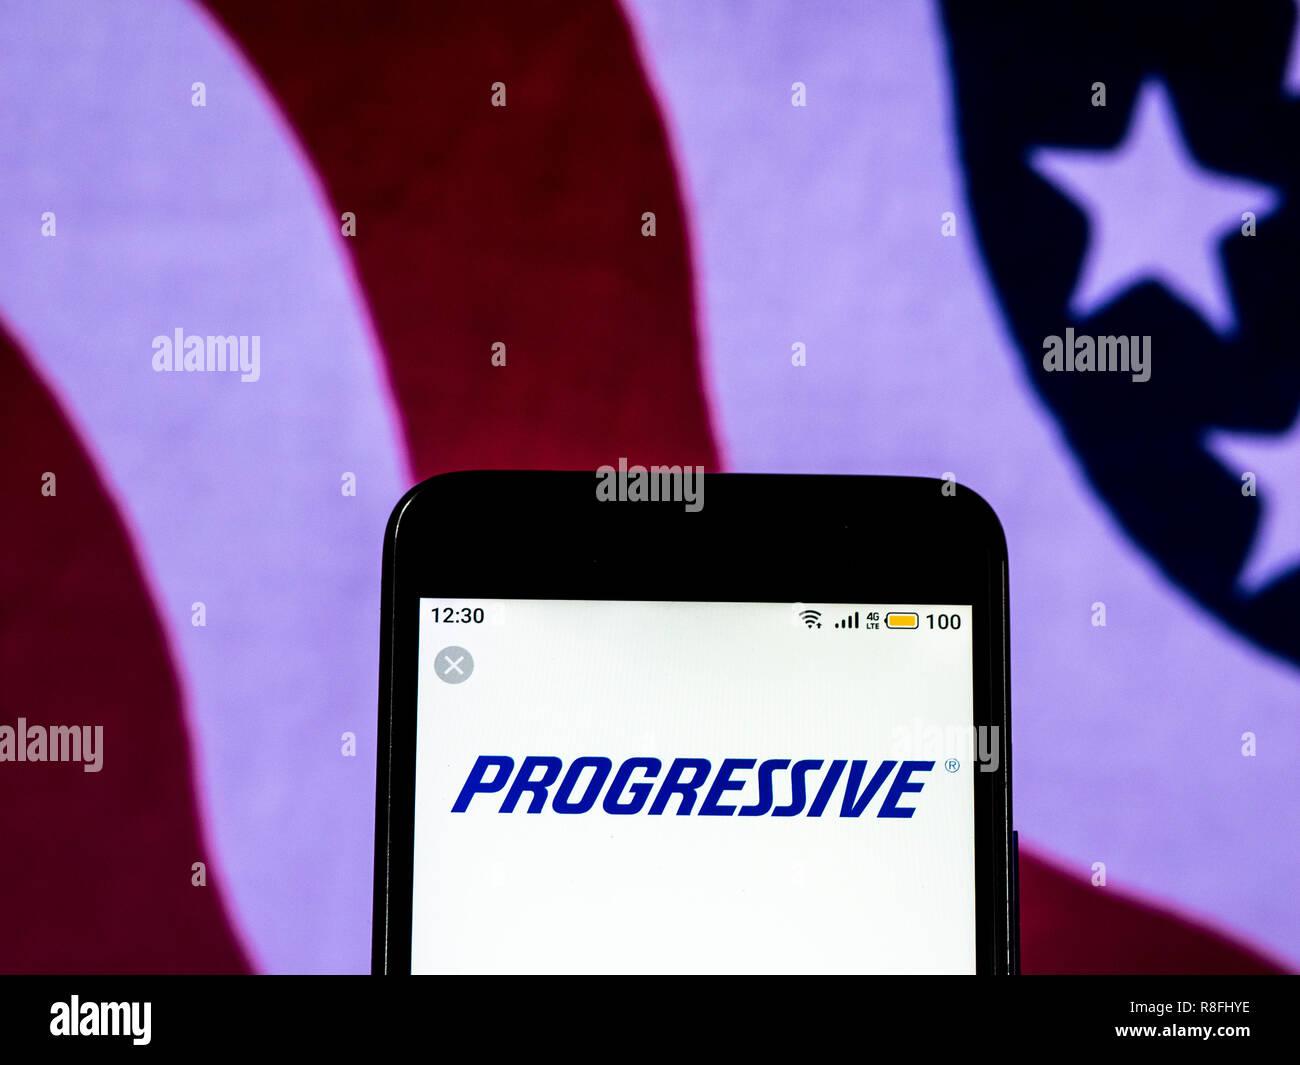 Progressive Corporation Car Insurance Company Logo Seen Displayed On